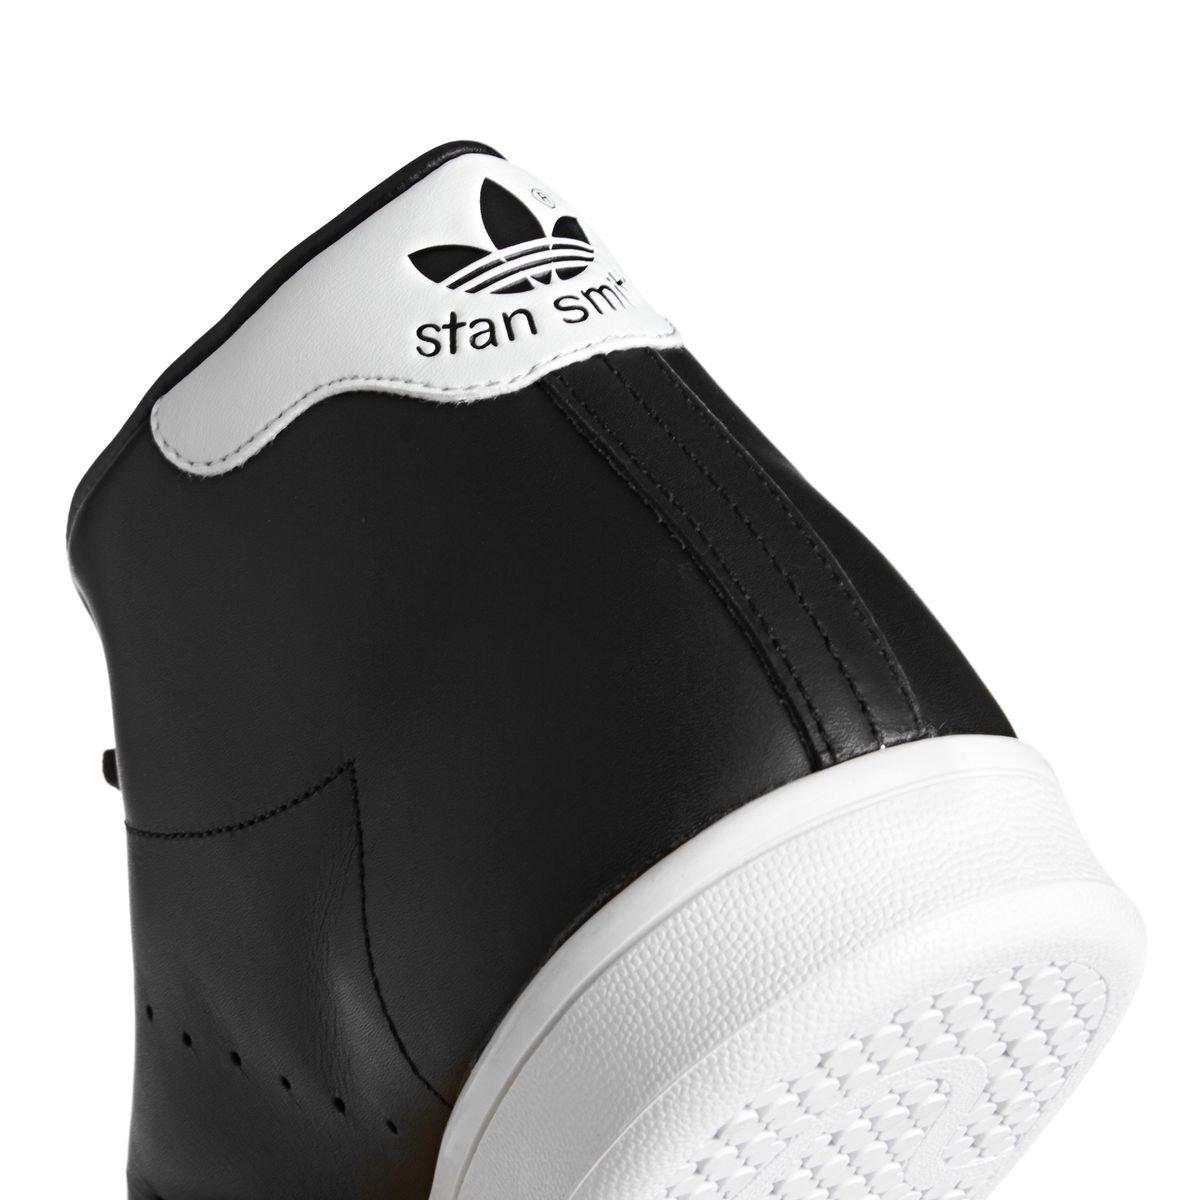 Adidas Stan Smith Mid Mid Mid S75027 Unisex - Erwachsene Sportschuh 13e44b